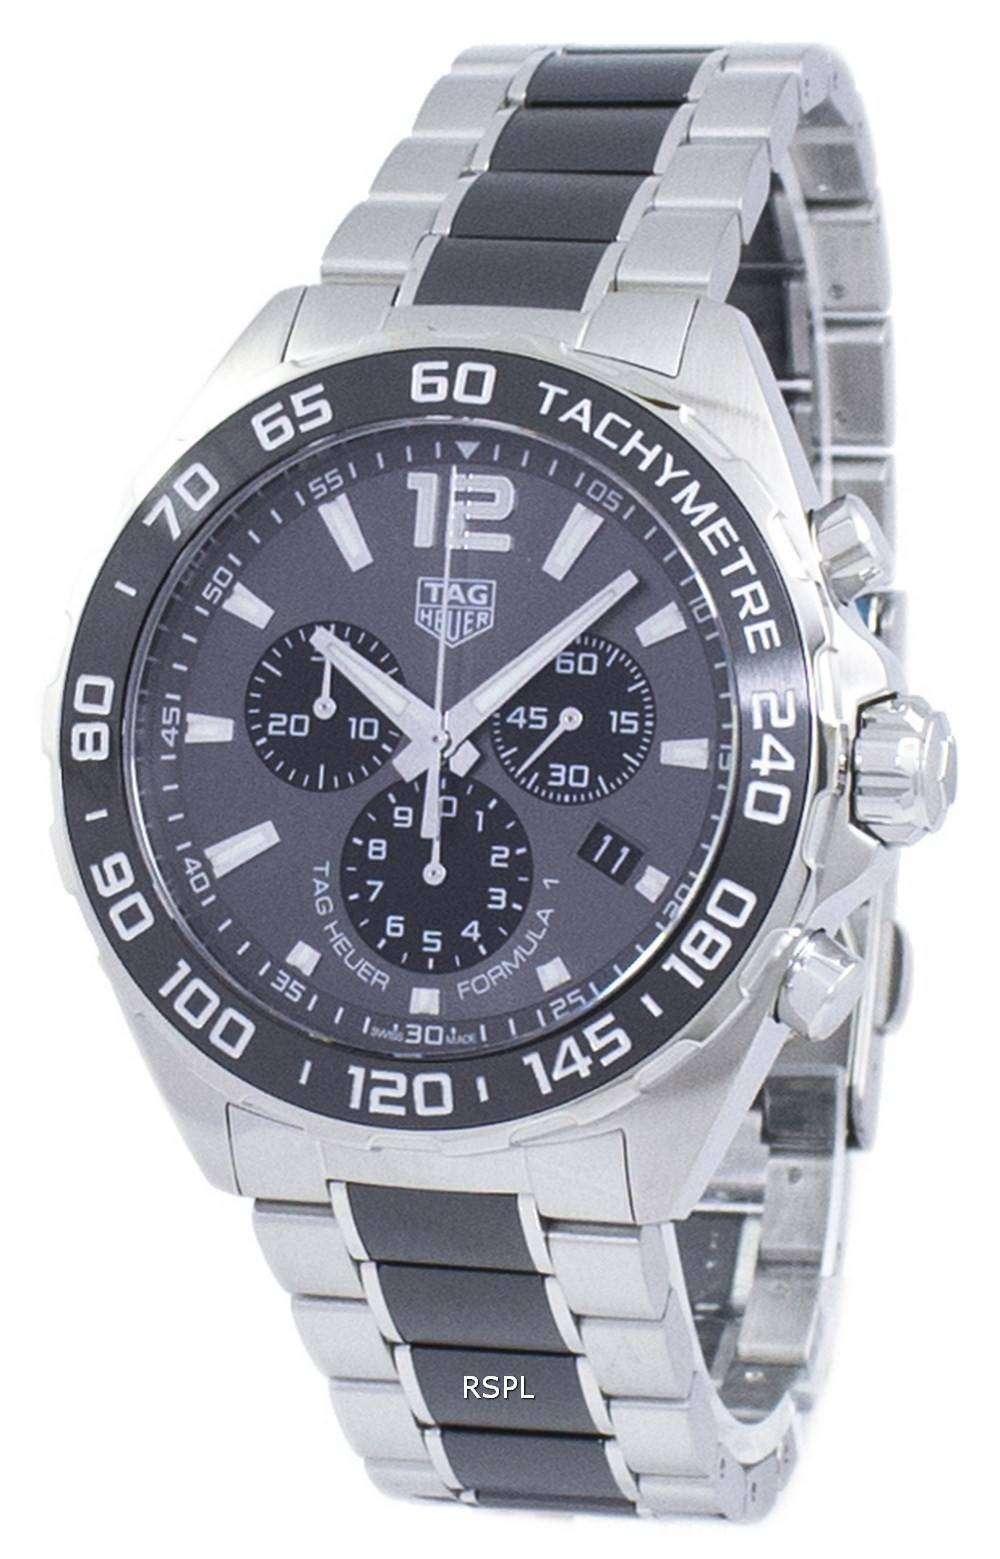 brand new ca0b7 89f0f タグ ・ ホイヤー カレラ フォーミュラ 1 クロノグラフ クォーツ CAZ1011。BA0843 メンズ腕時計